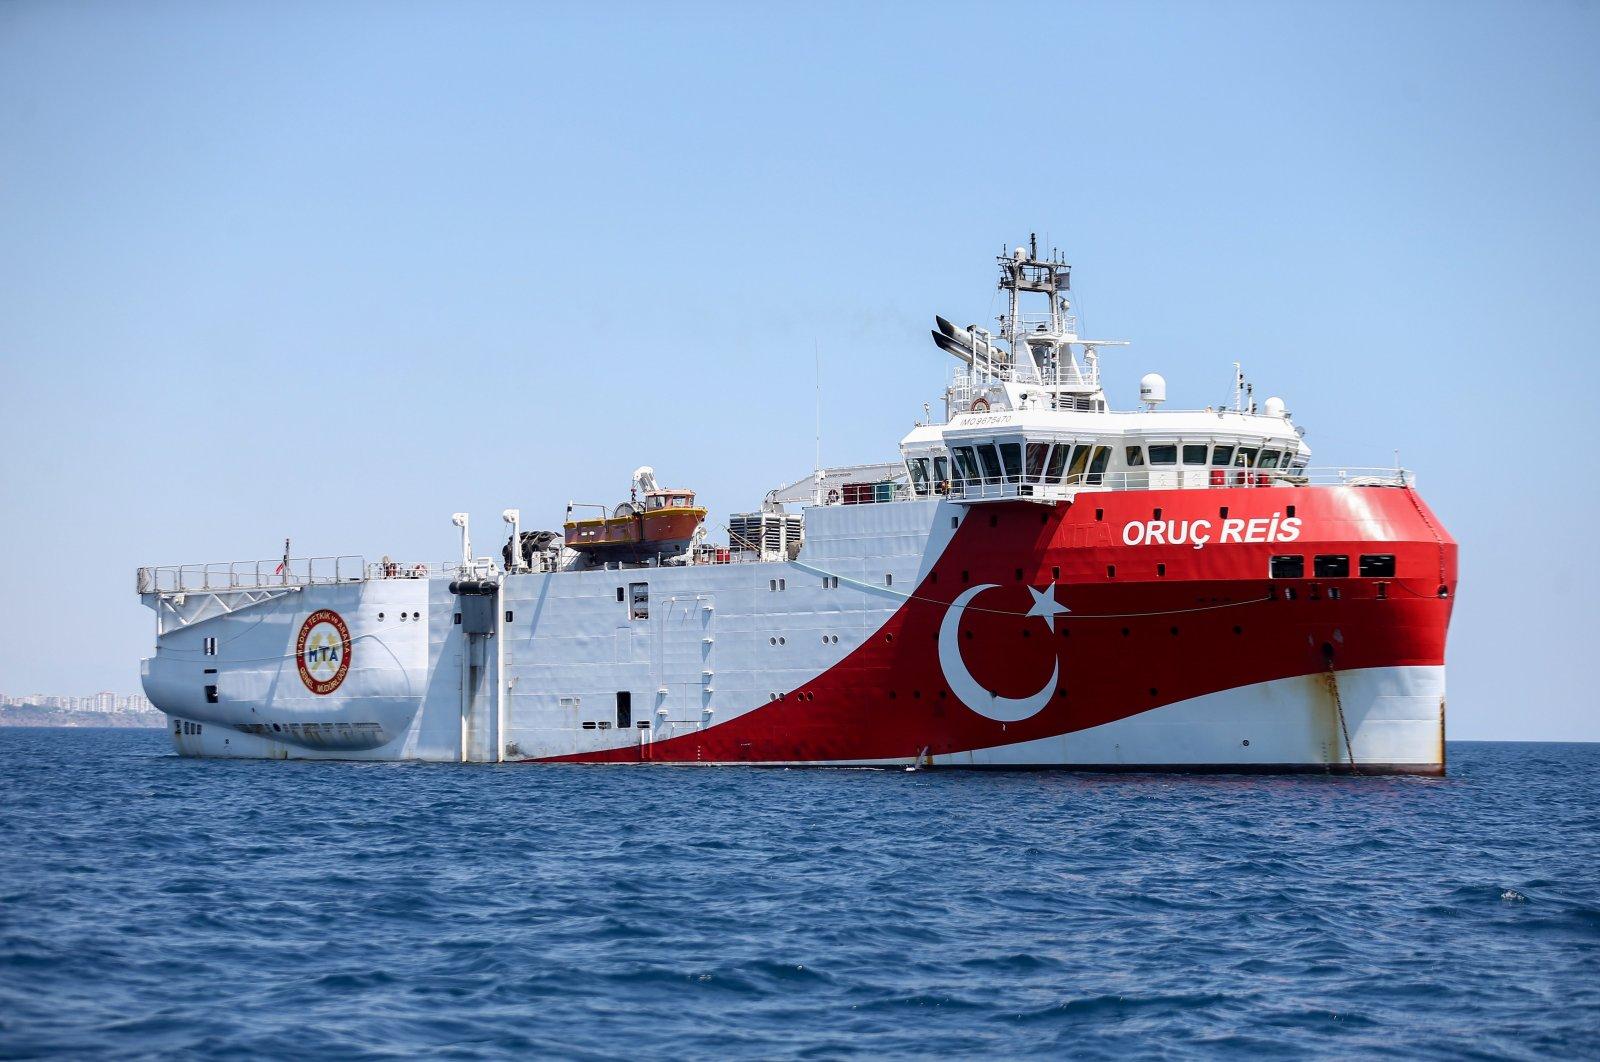 Turkey's seismic exploration vessel Oruç Reis sails in the Mediterranean, July 29, 2020. (AA Photo)